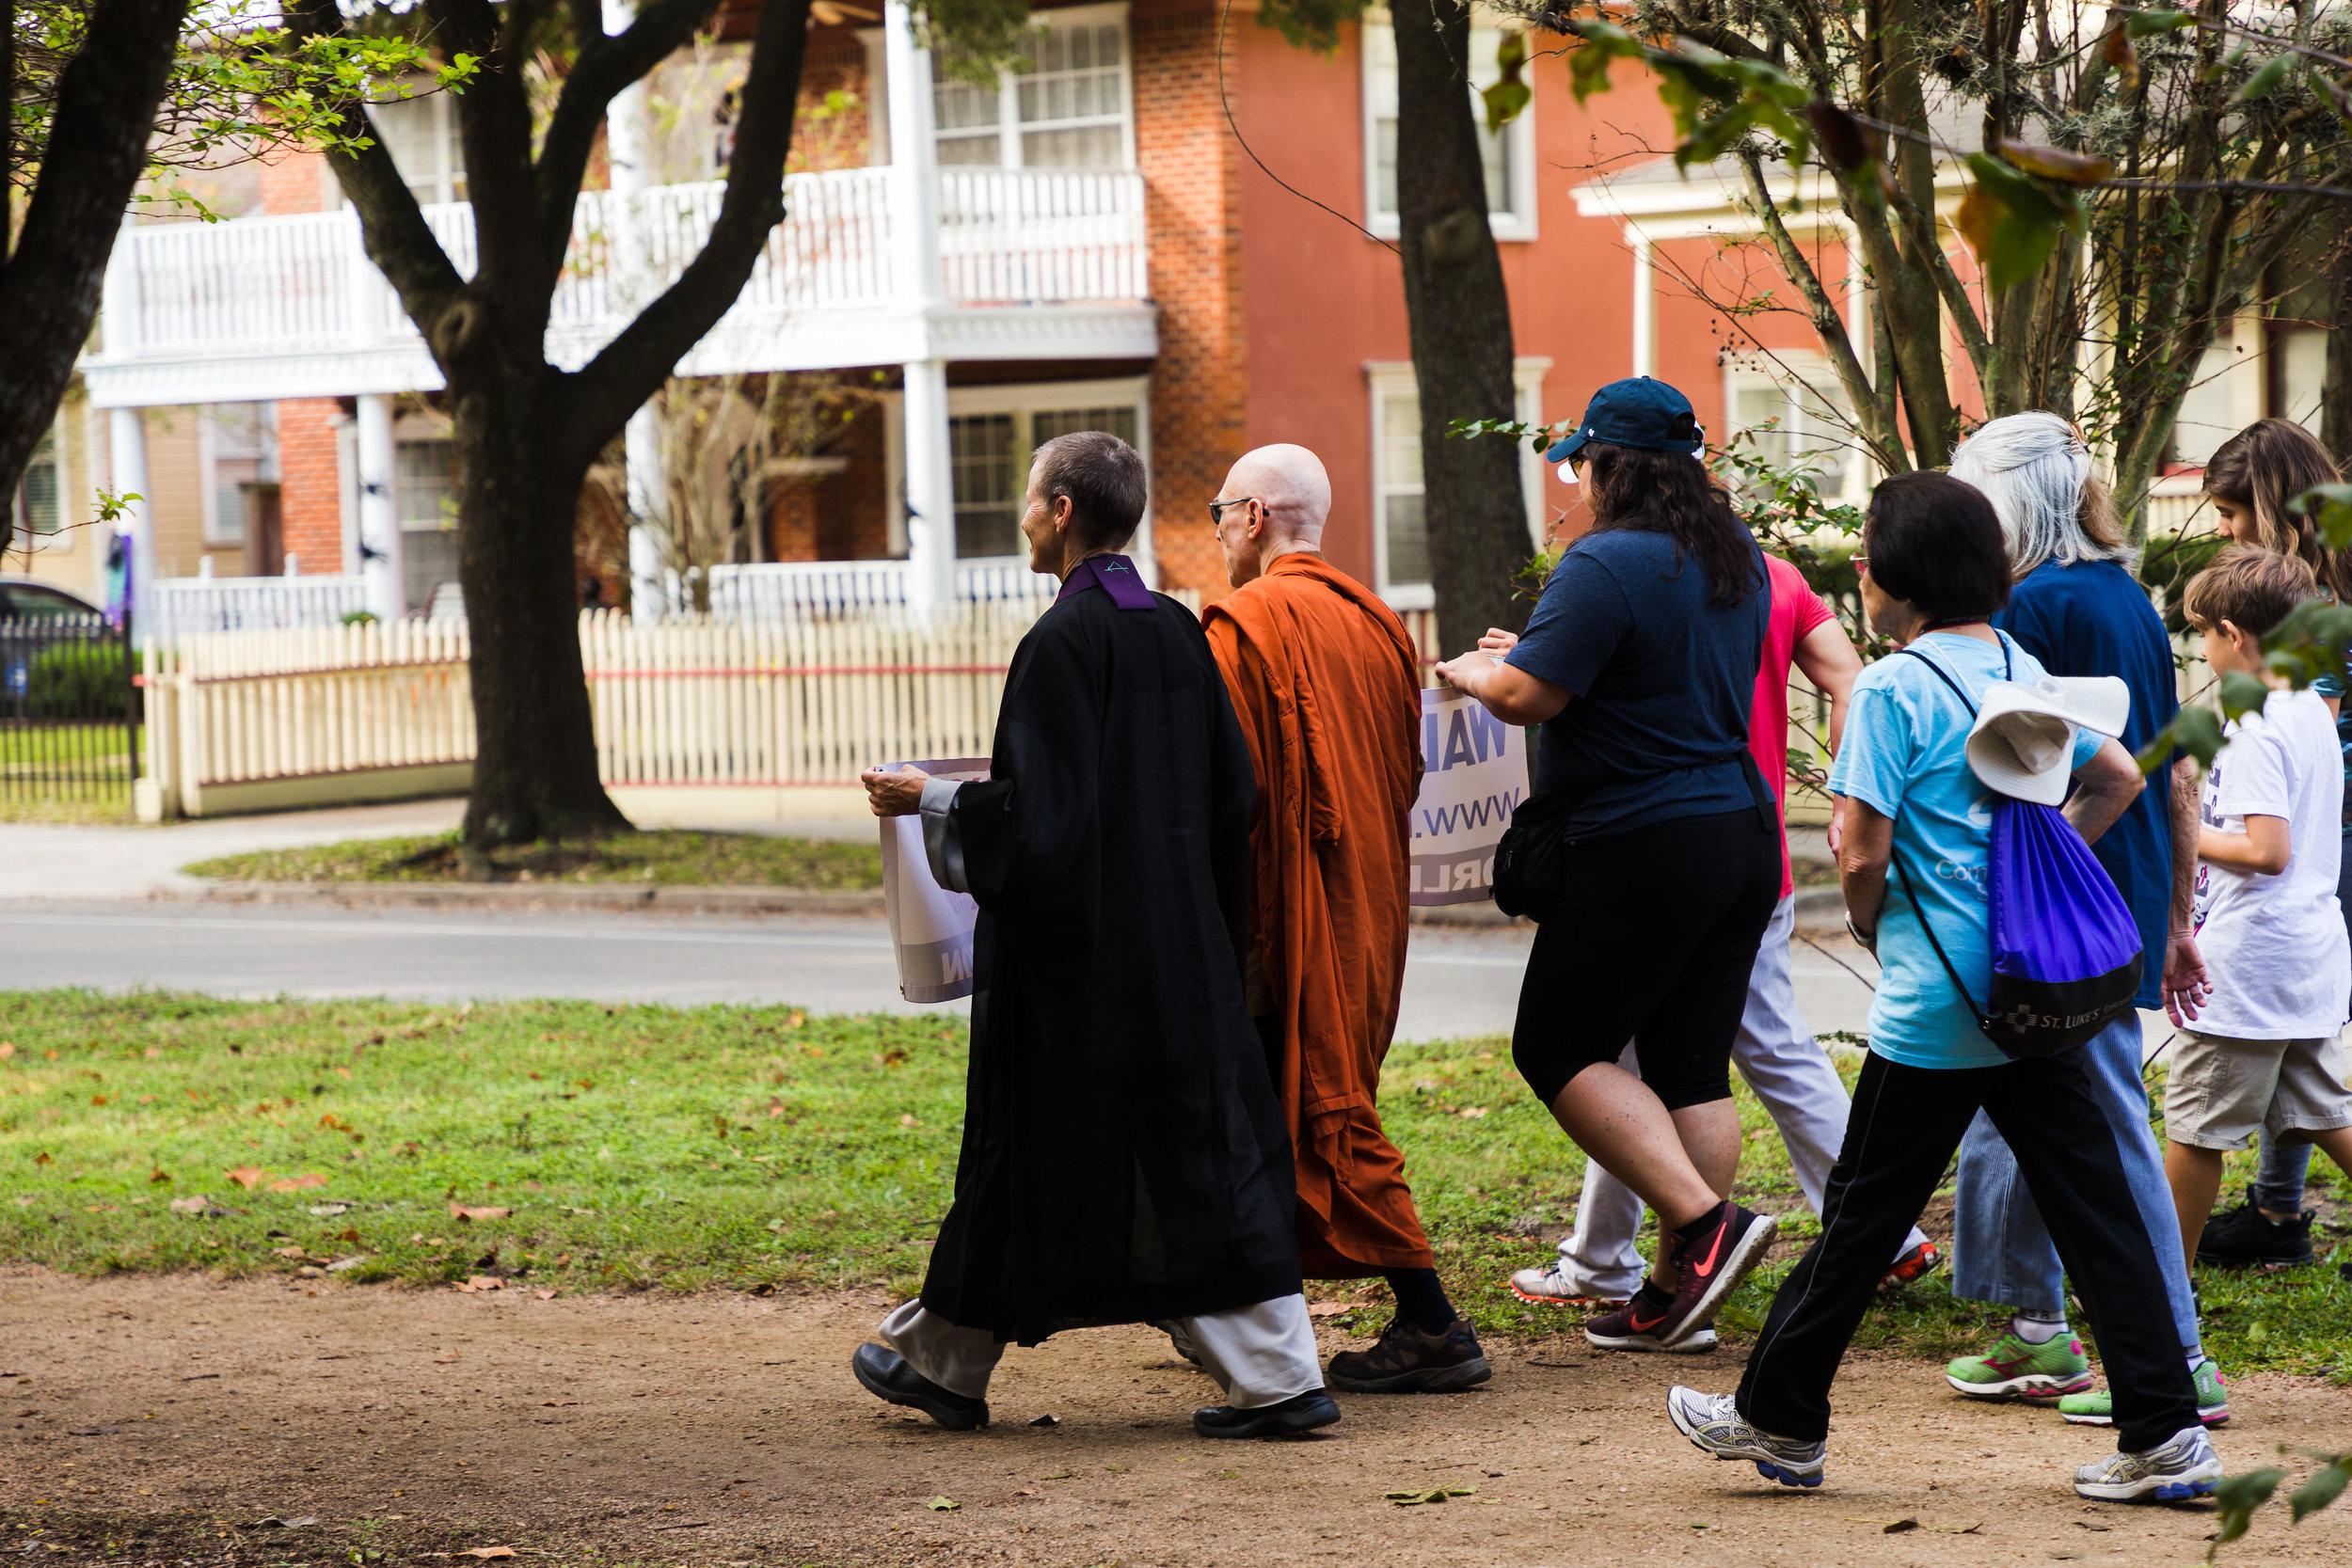 Bhikkhu-Bodhi-Global-Relief-Houston-Zen-Walk-49.jpg